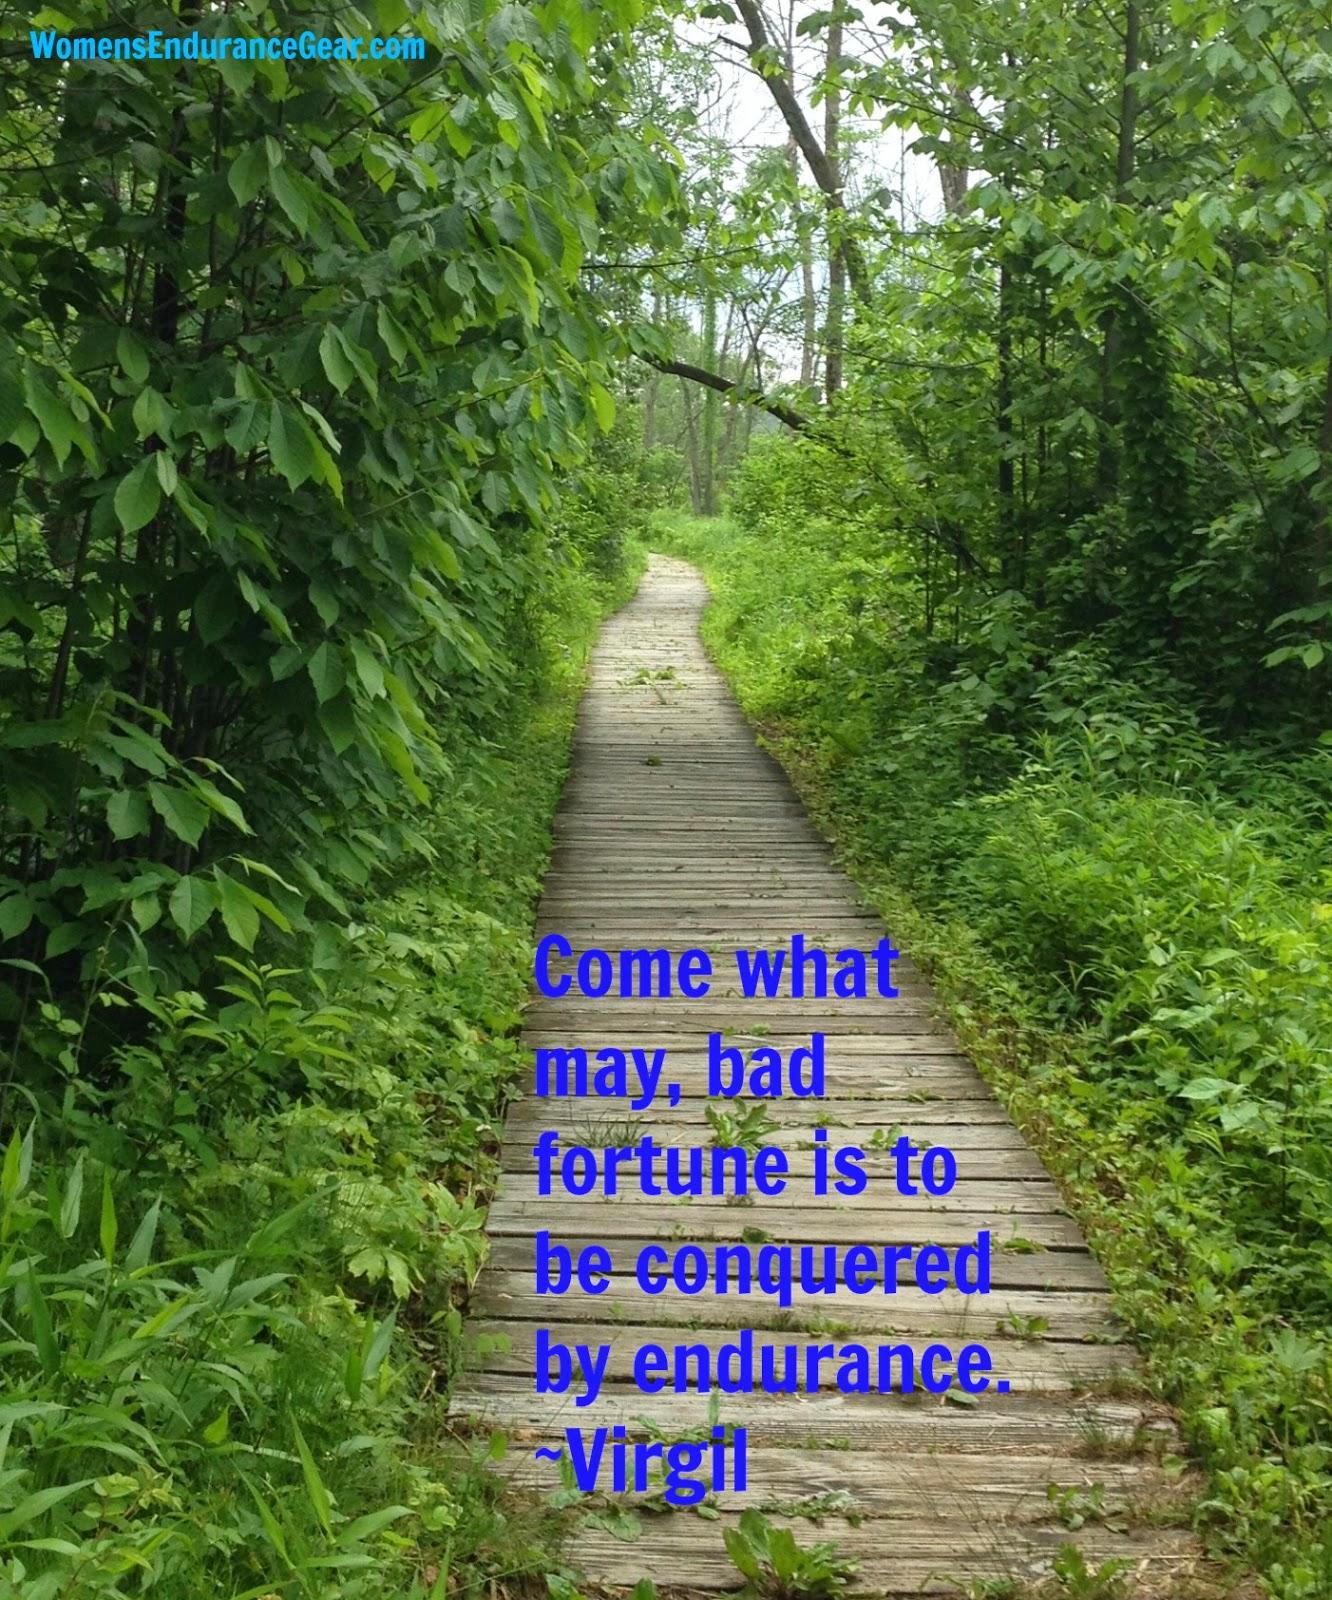 Endurance - Virgil